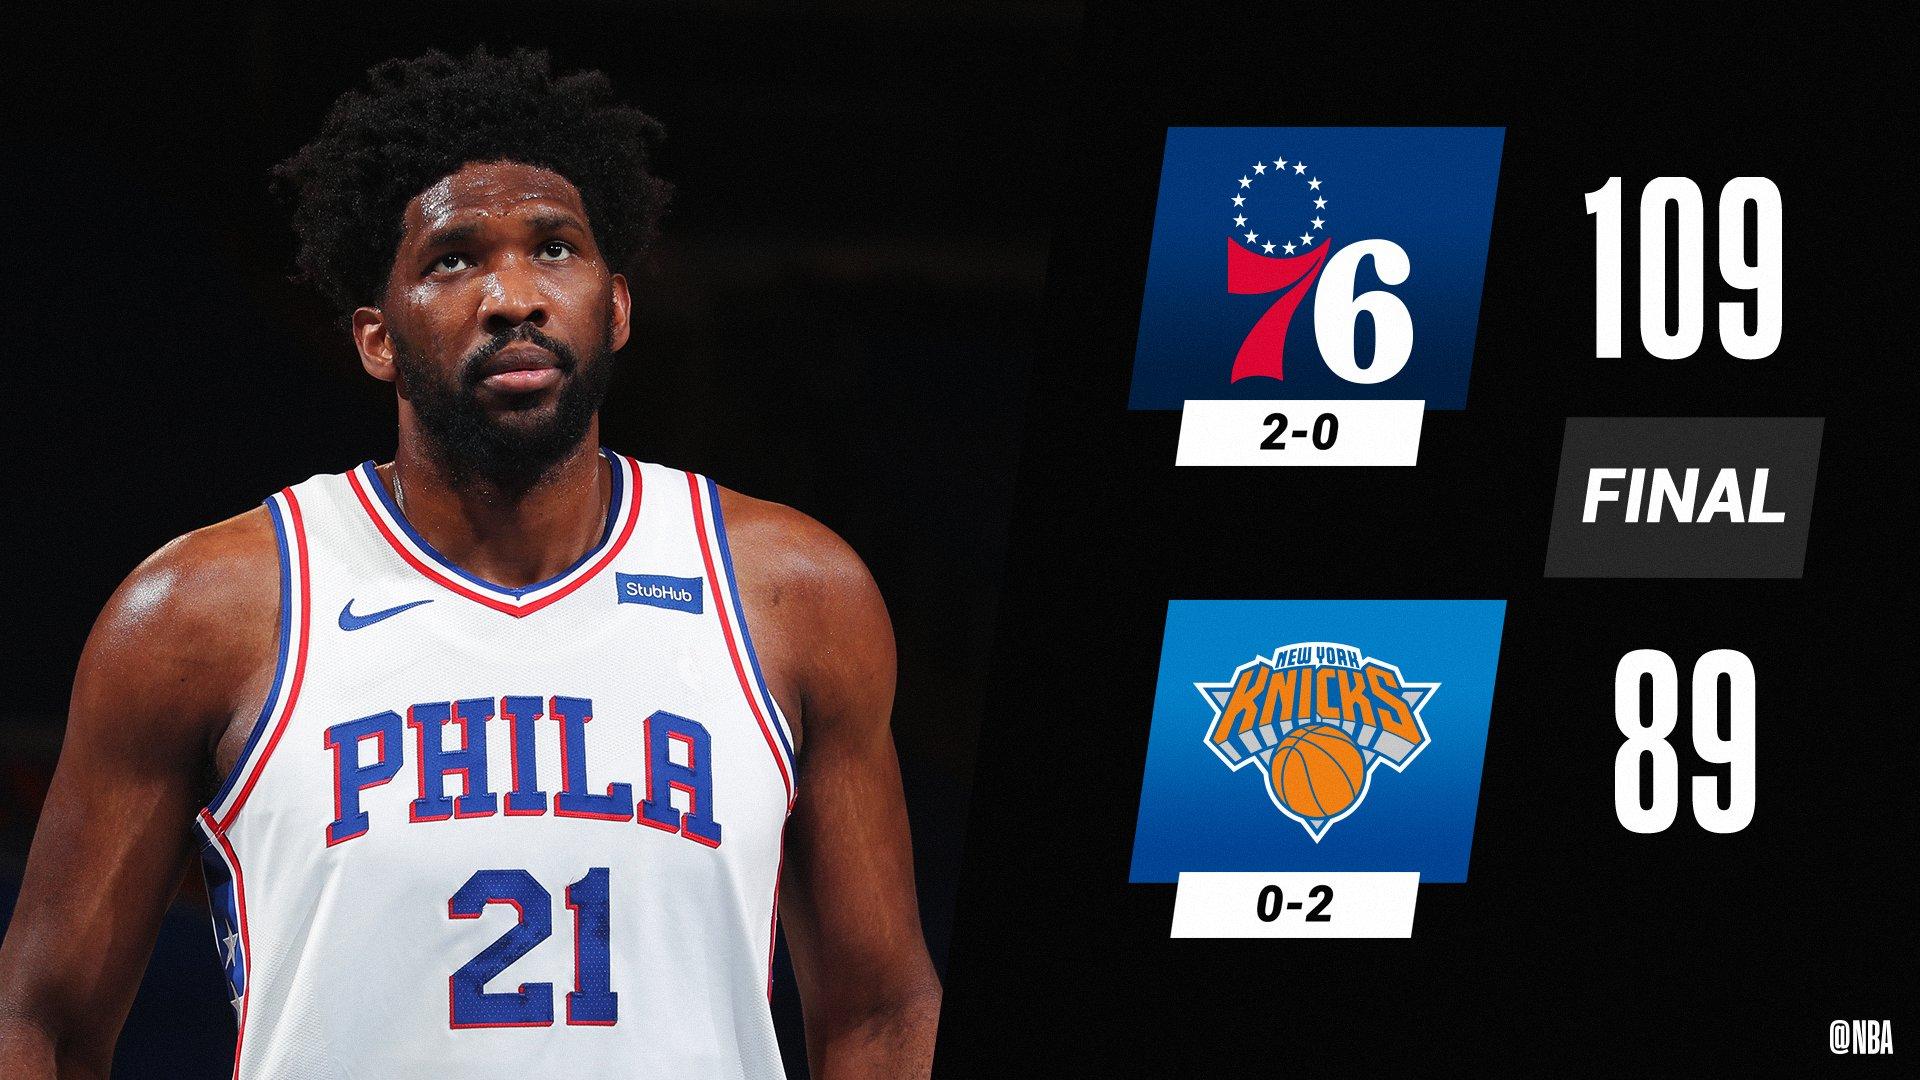 27-12-5